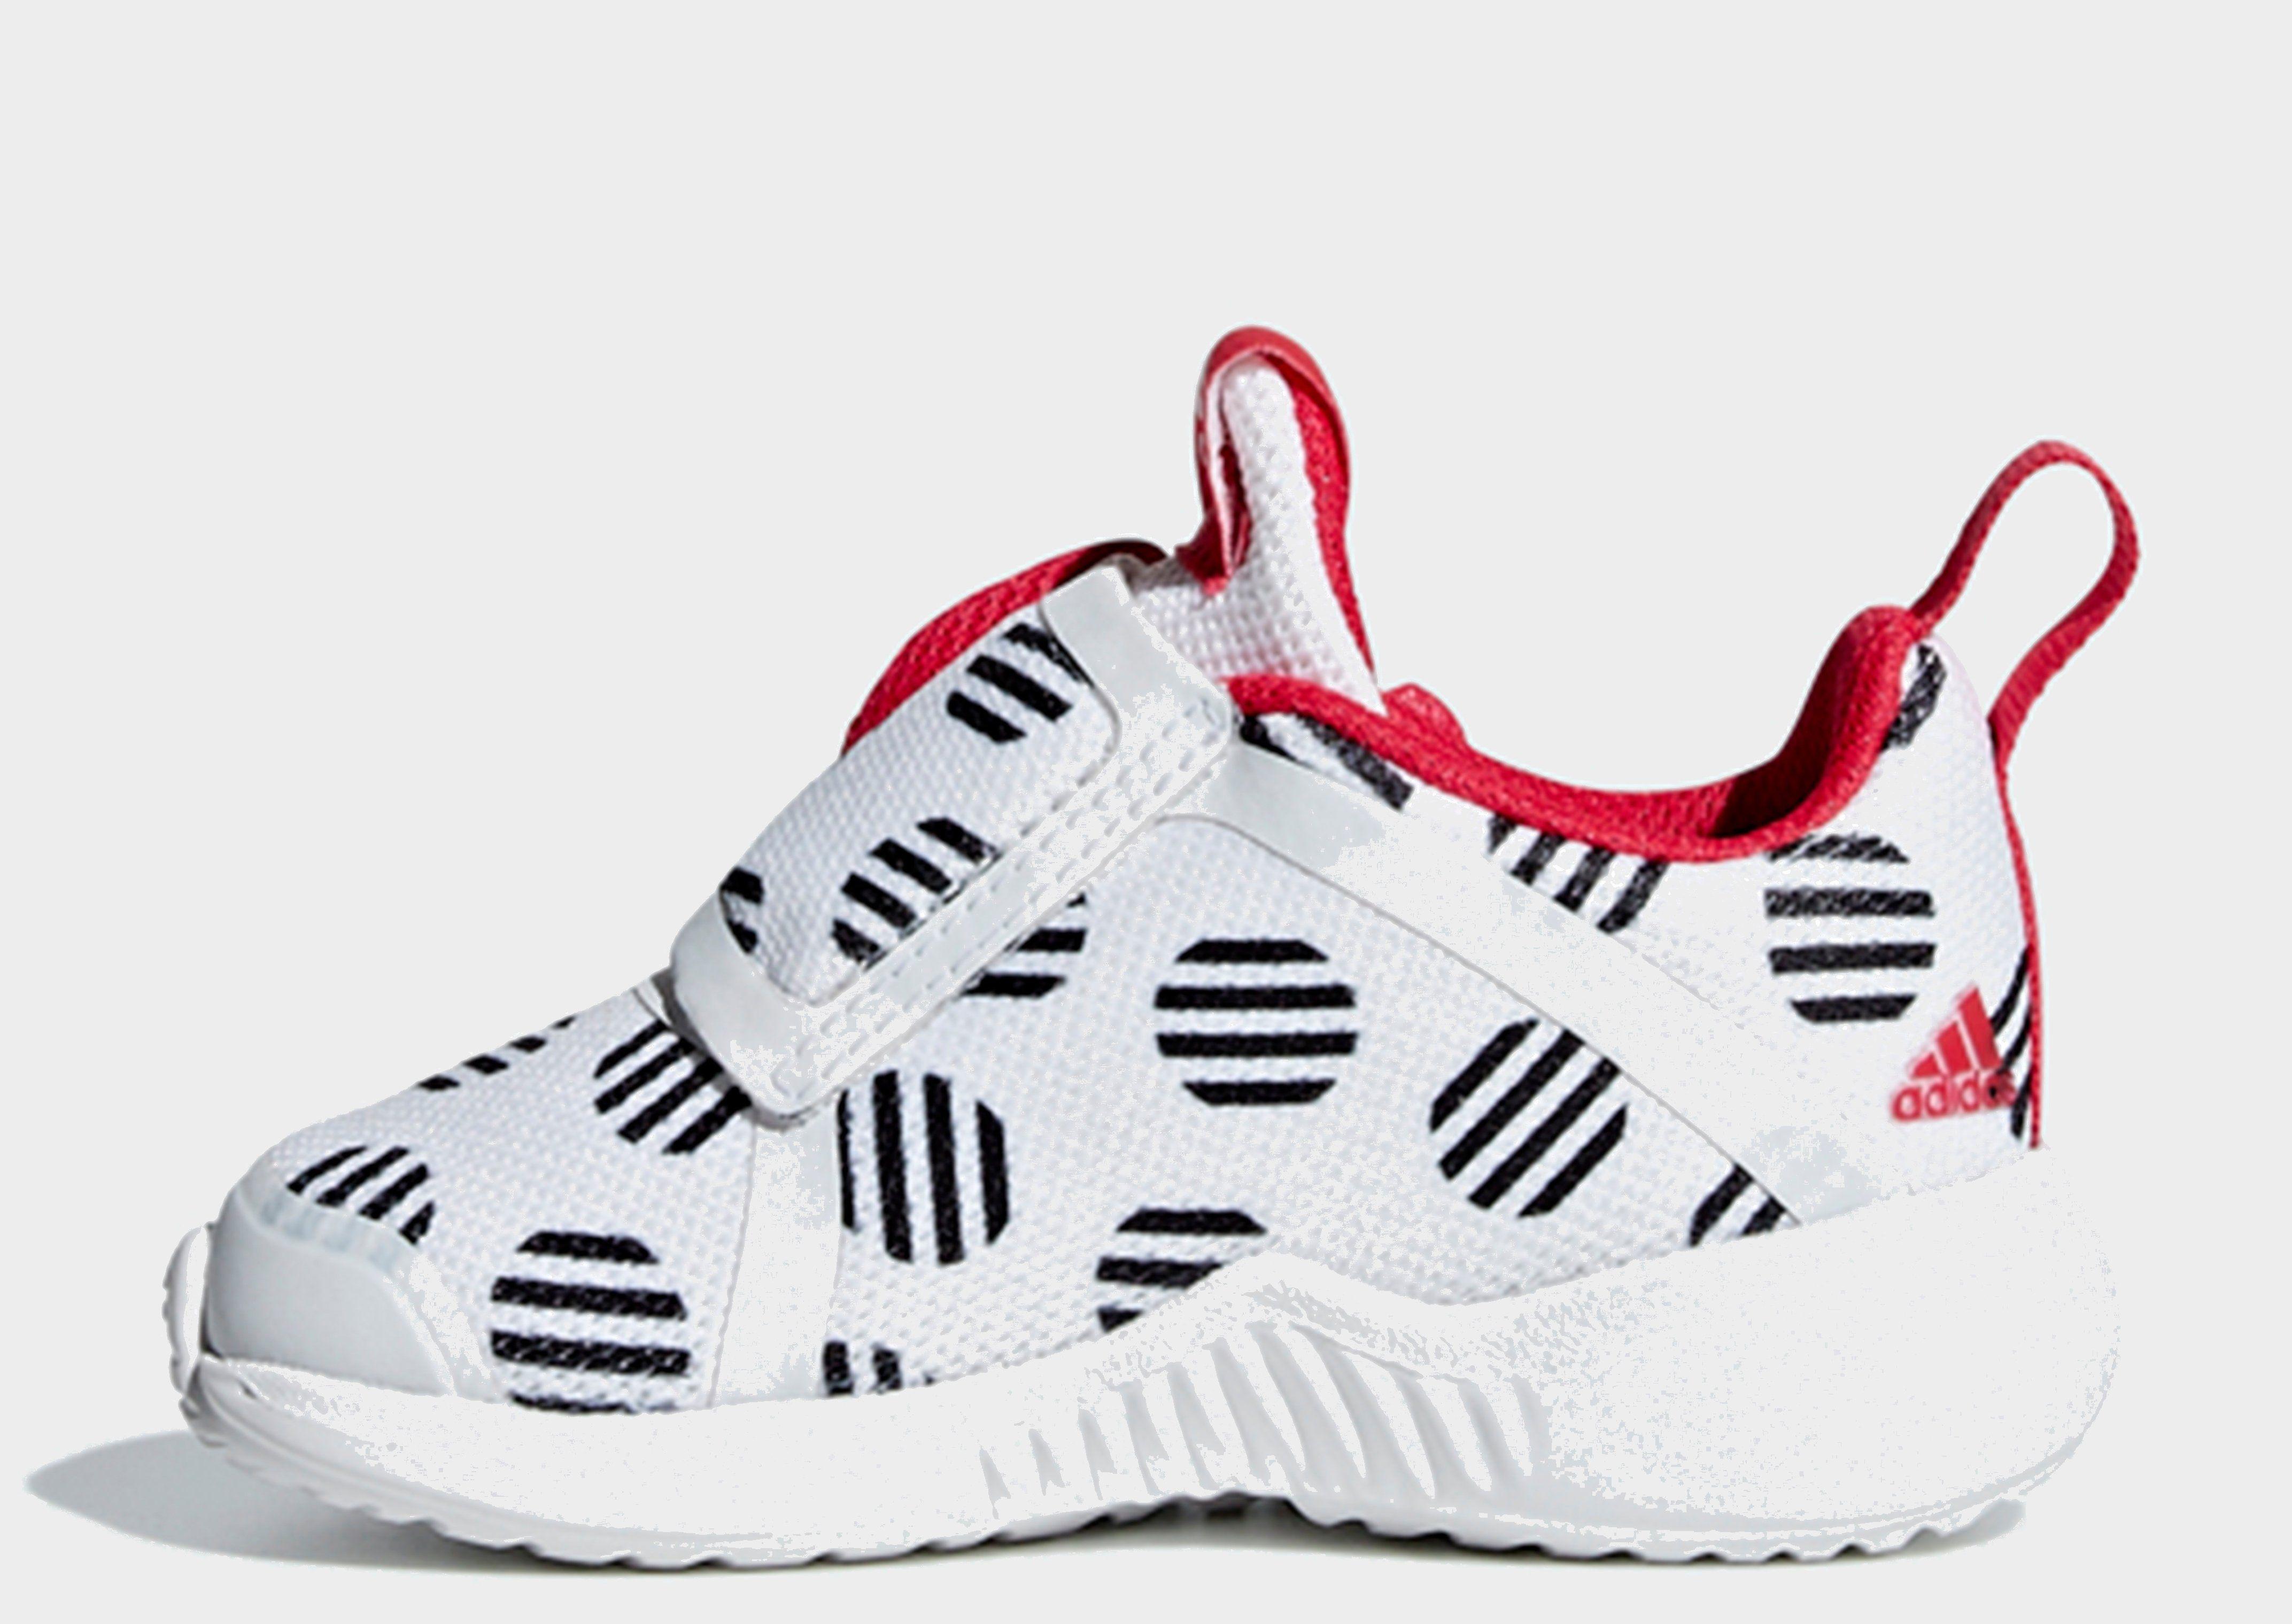 ADIDAS FortaRun X Shoes  b88c35a1c